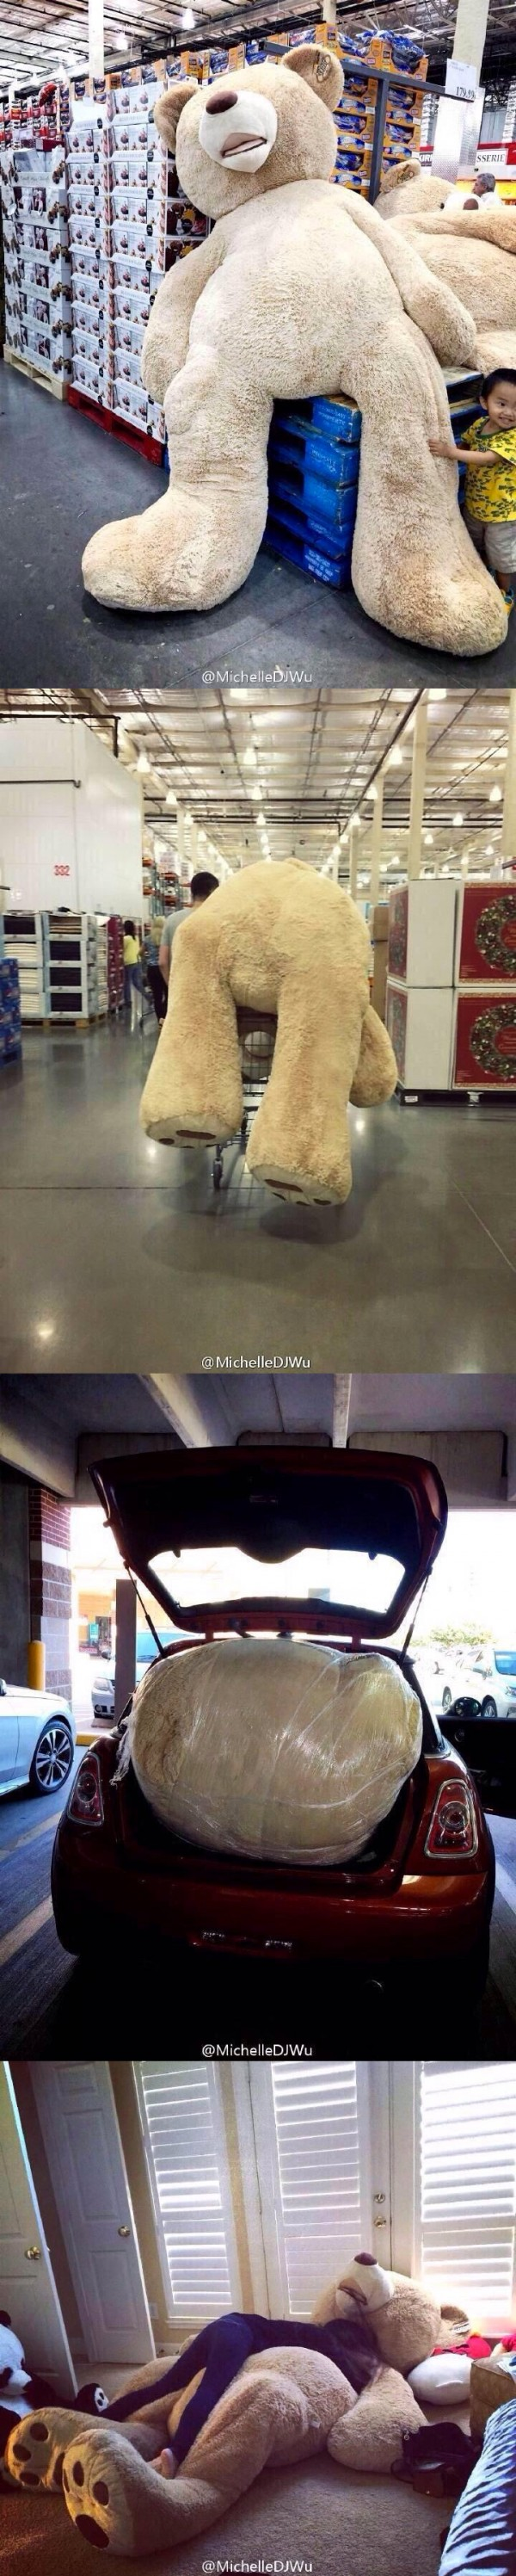 La vida de un oso de peluche